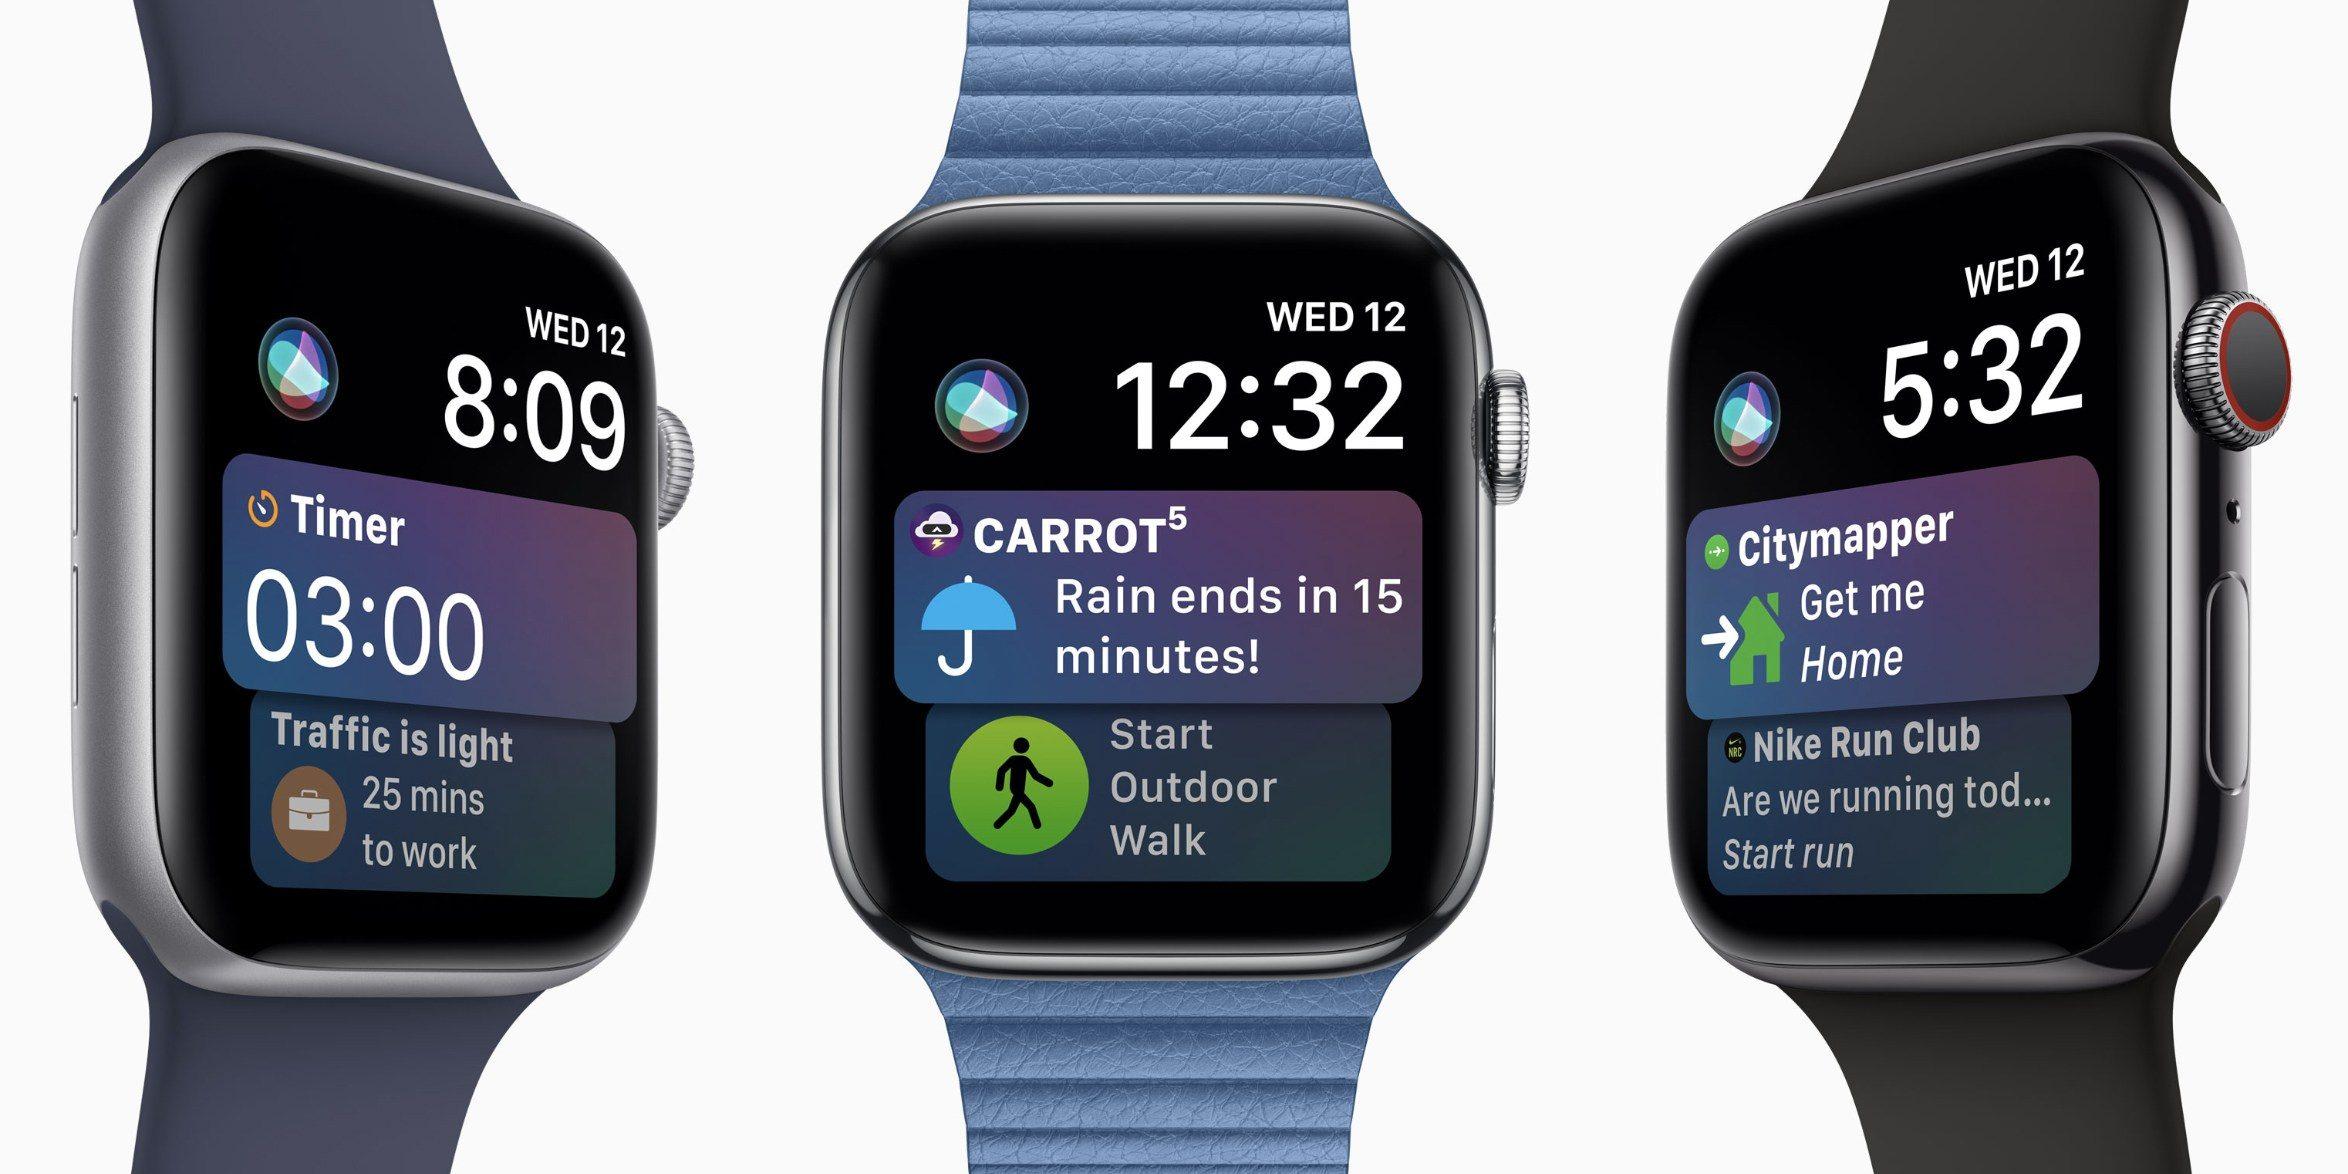 Apple Watch Series 4 is $70 off, plus deals on Sonos speakers and iOttie mounts